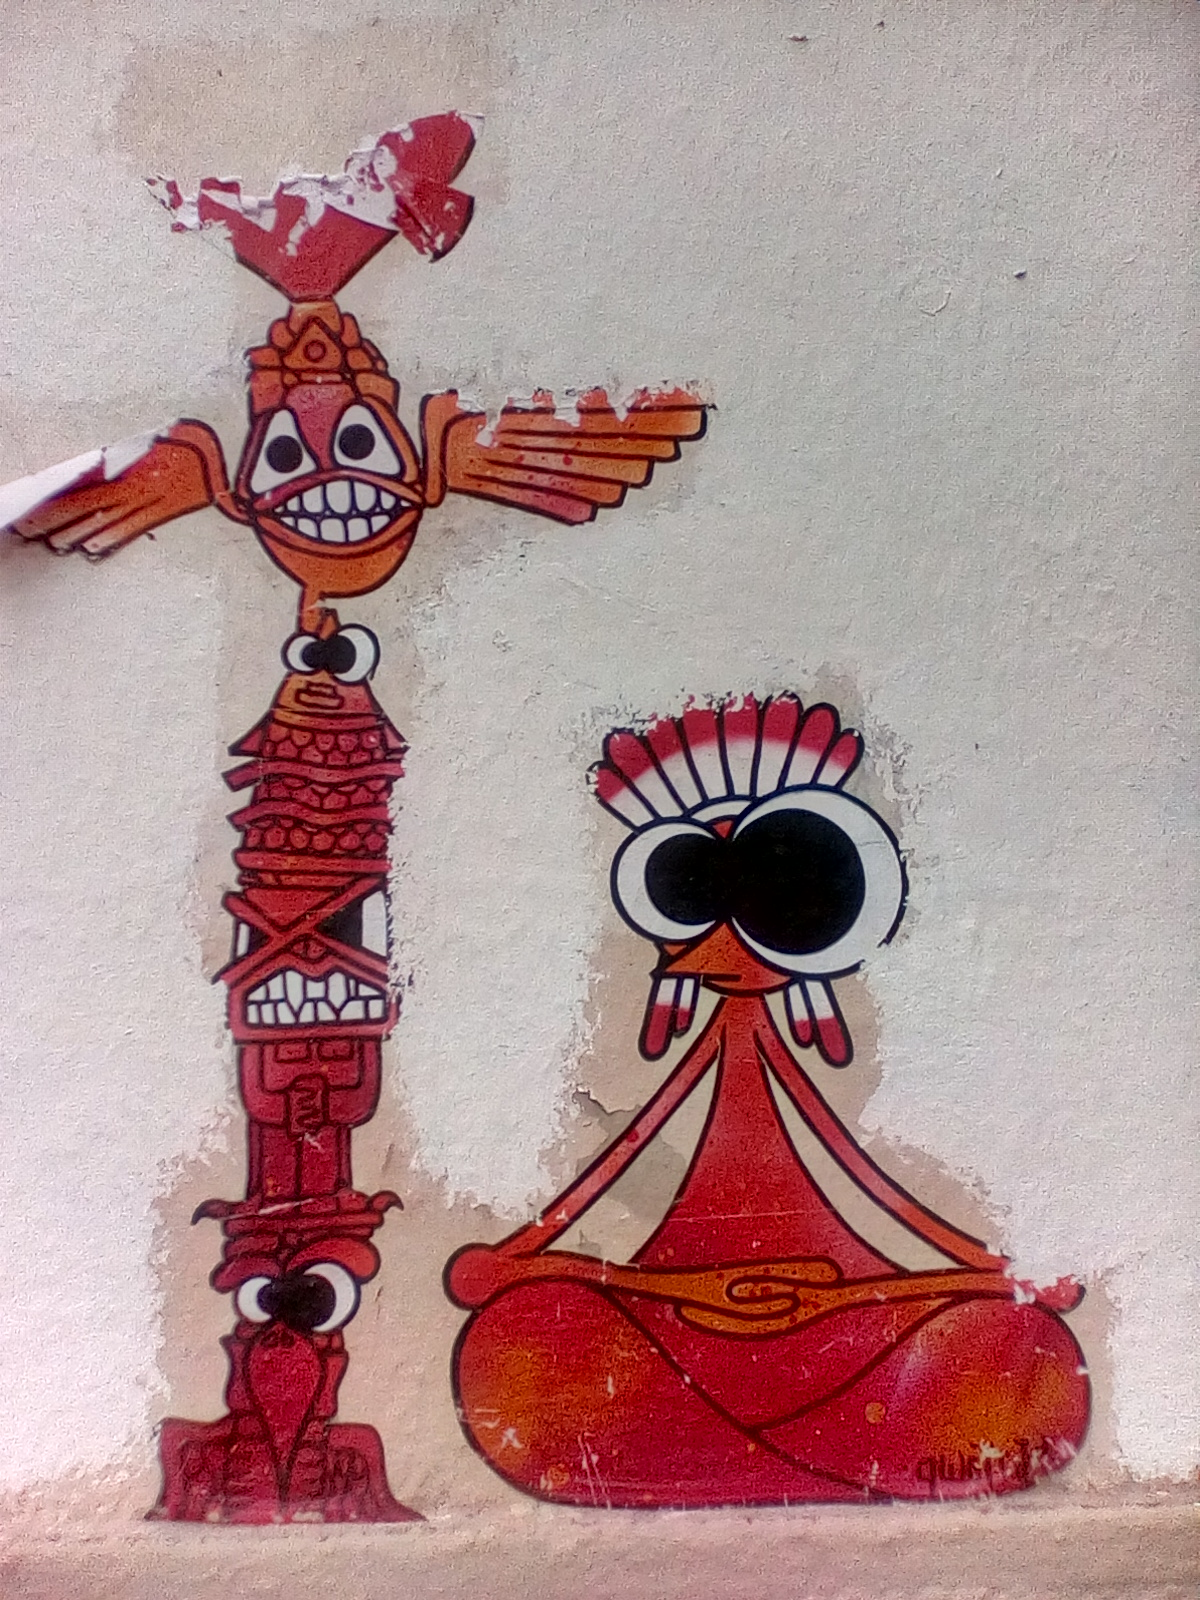 Paris grafity